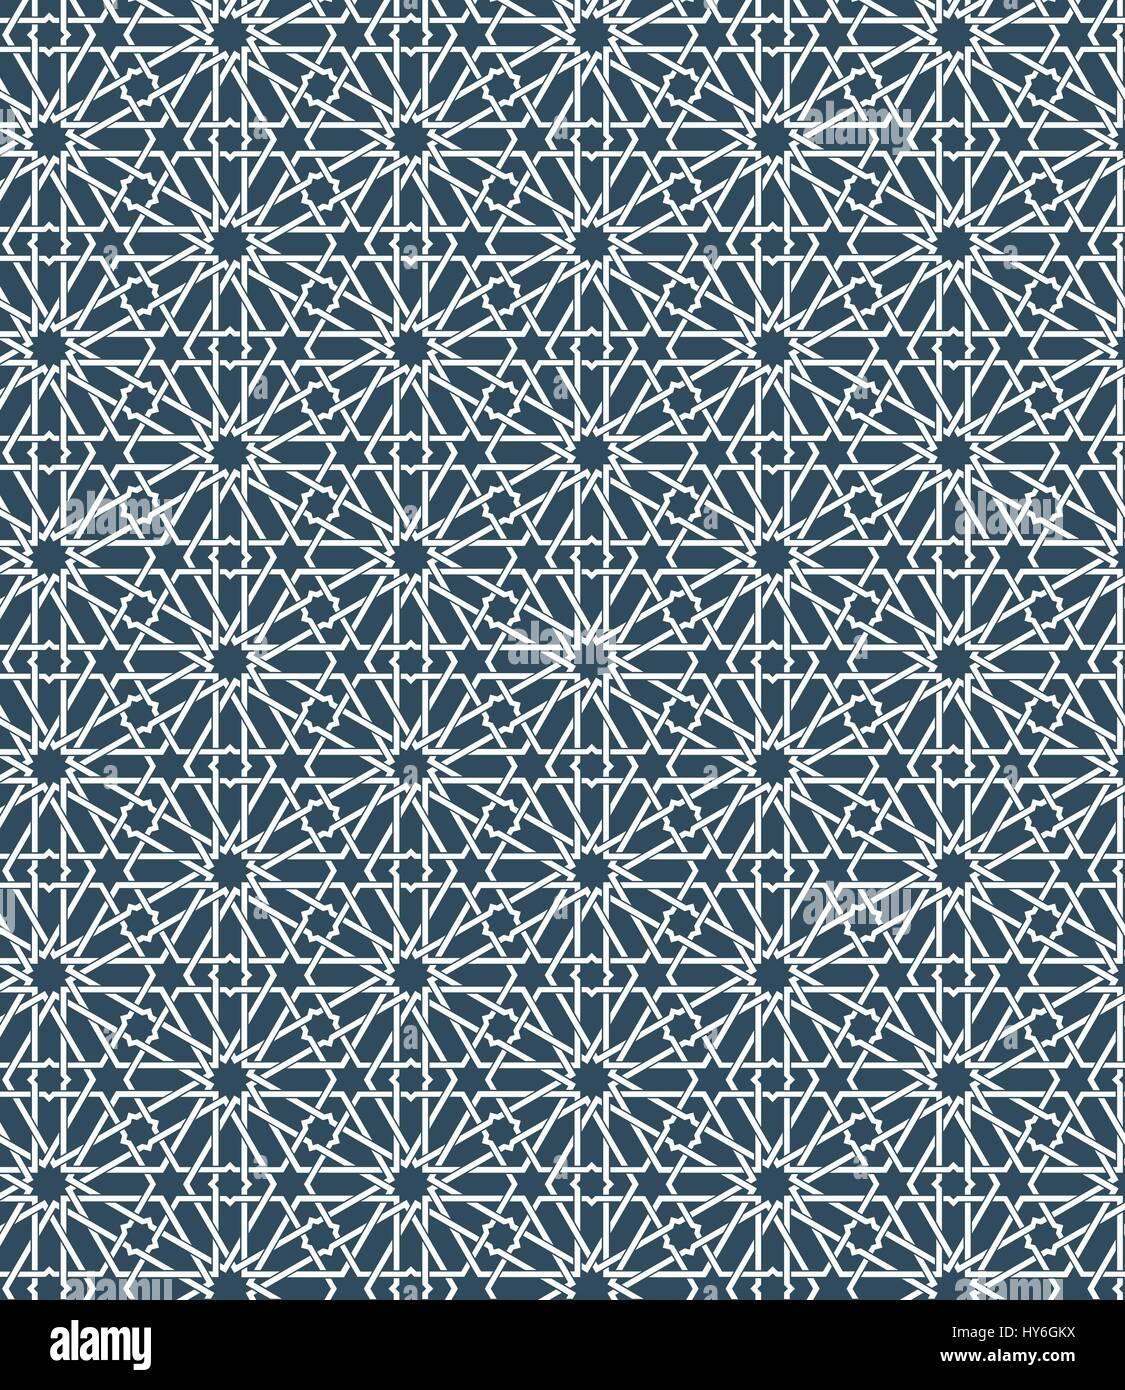 Moroccan Design Seamless Islamic Moroccan Pattern Arabic Geometric Ornament